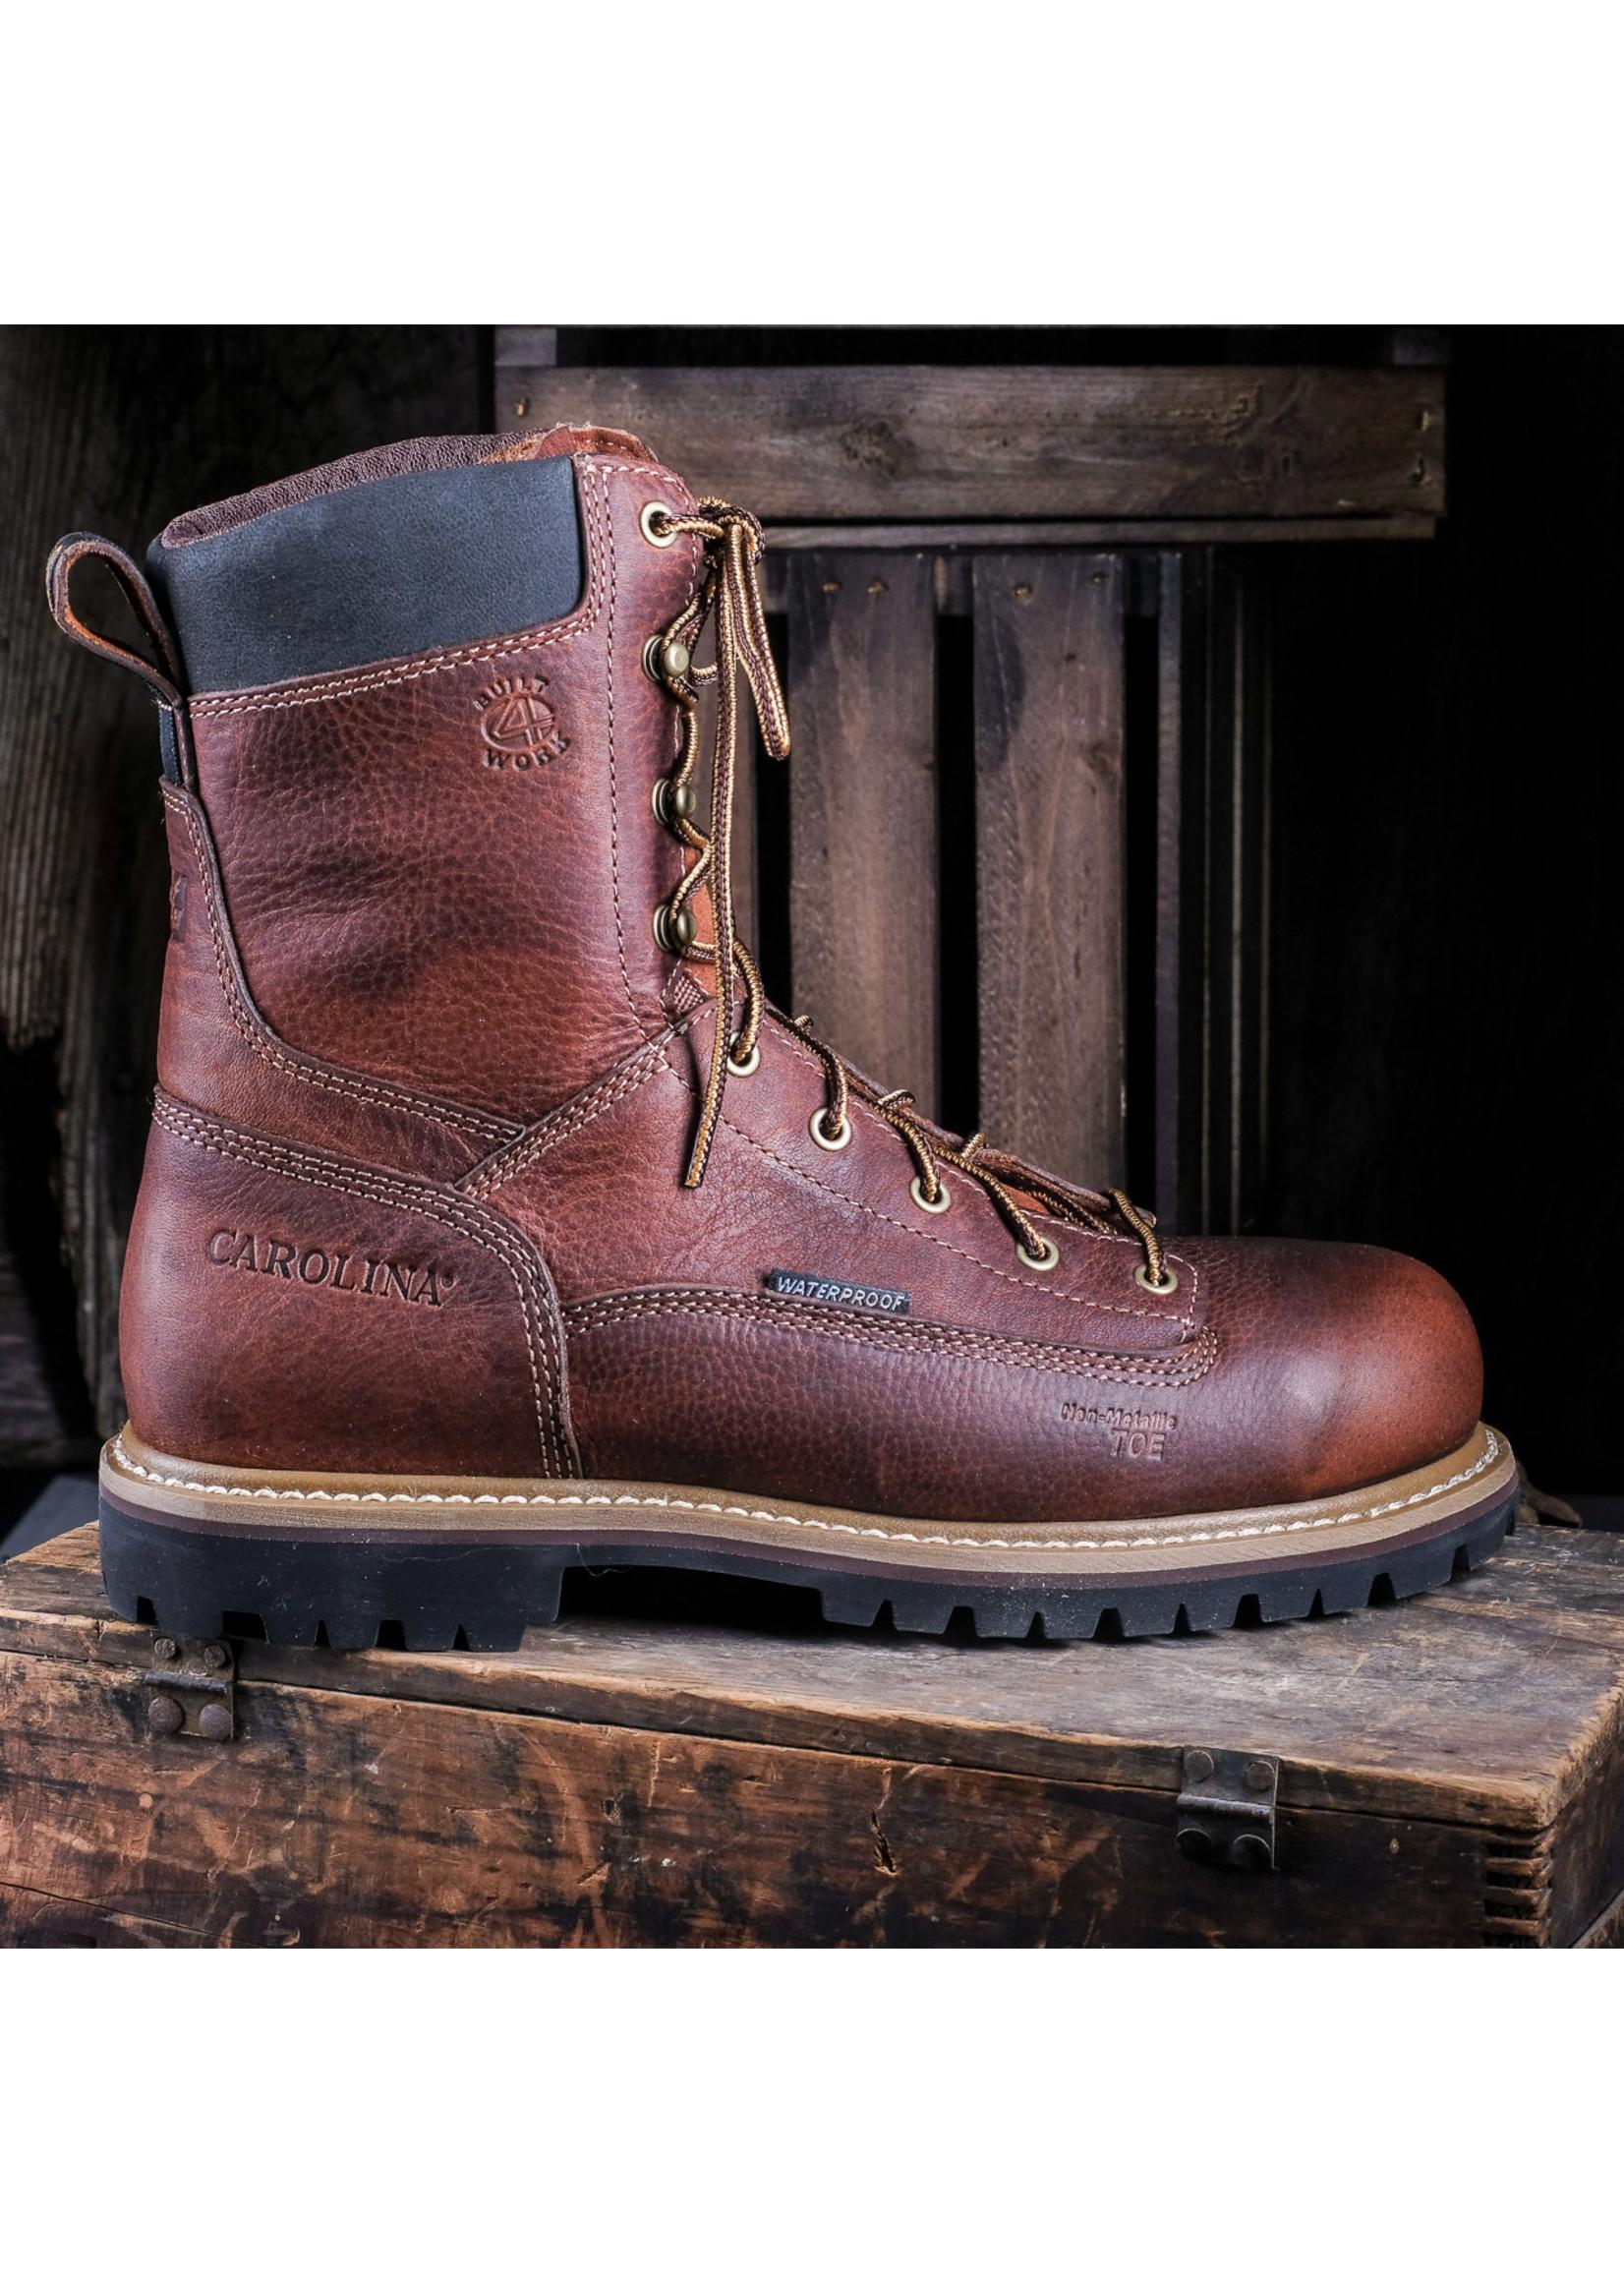 "Carolina Grind 8"" Lace-up Composite Toe Work Boot CA5529"